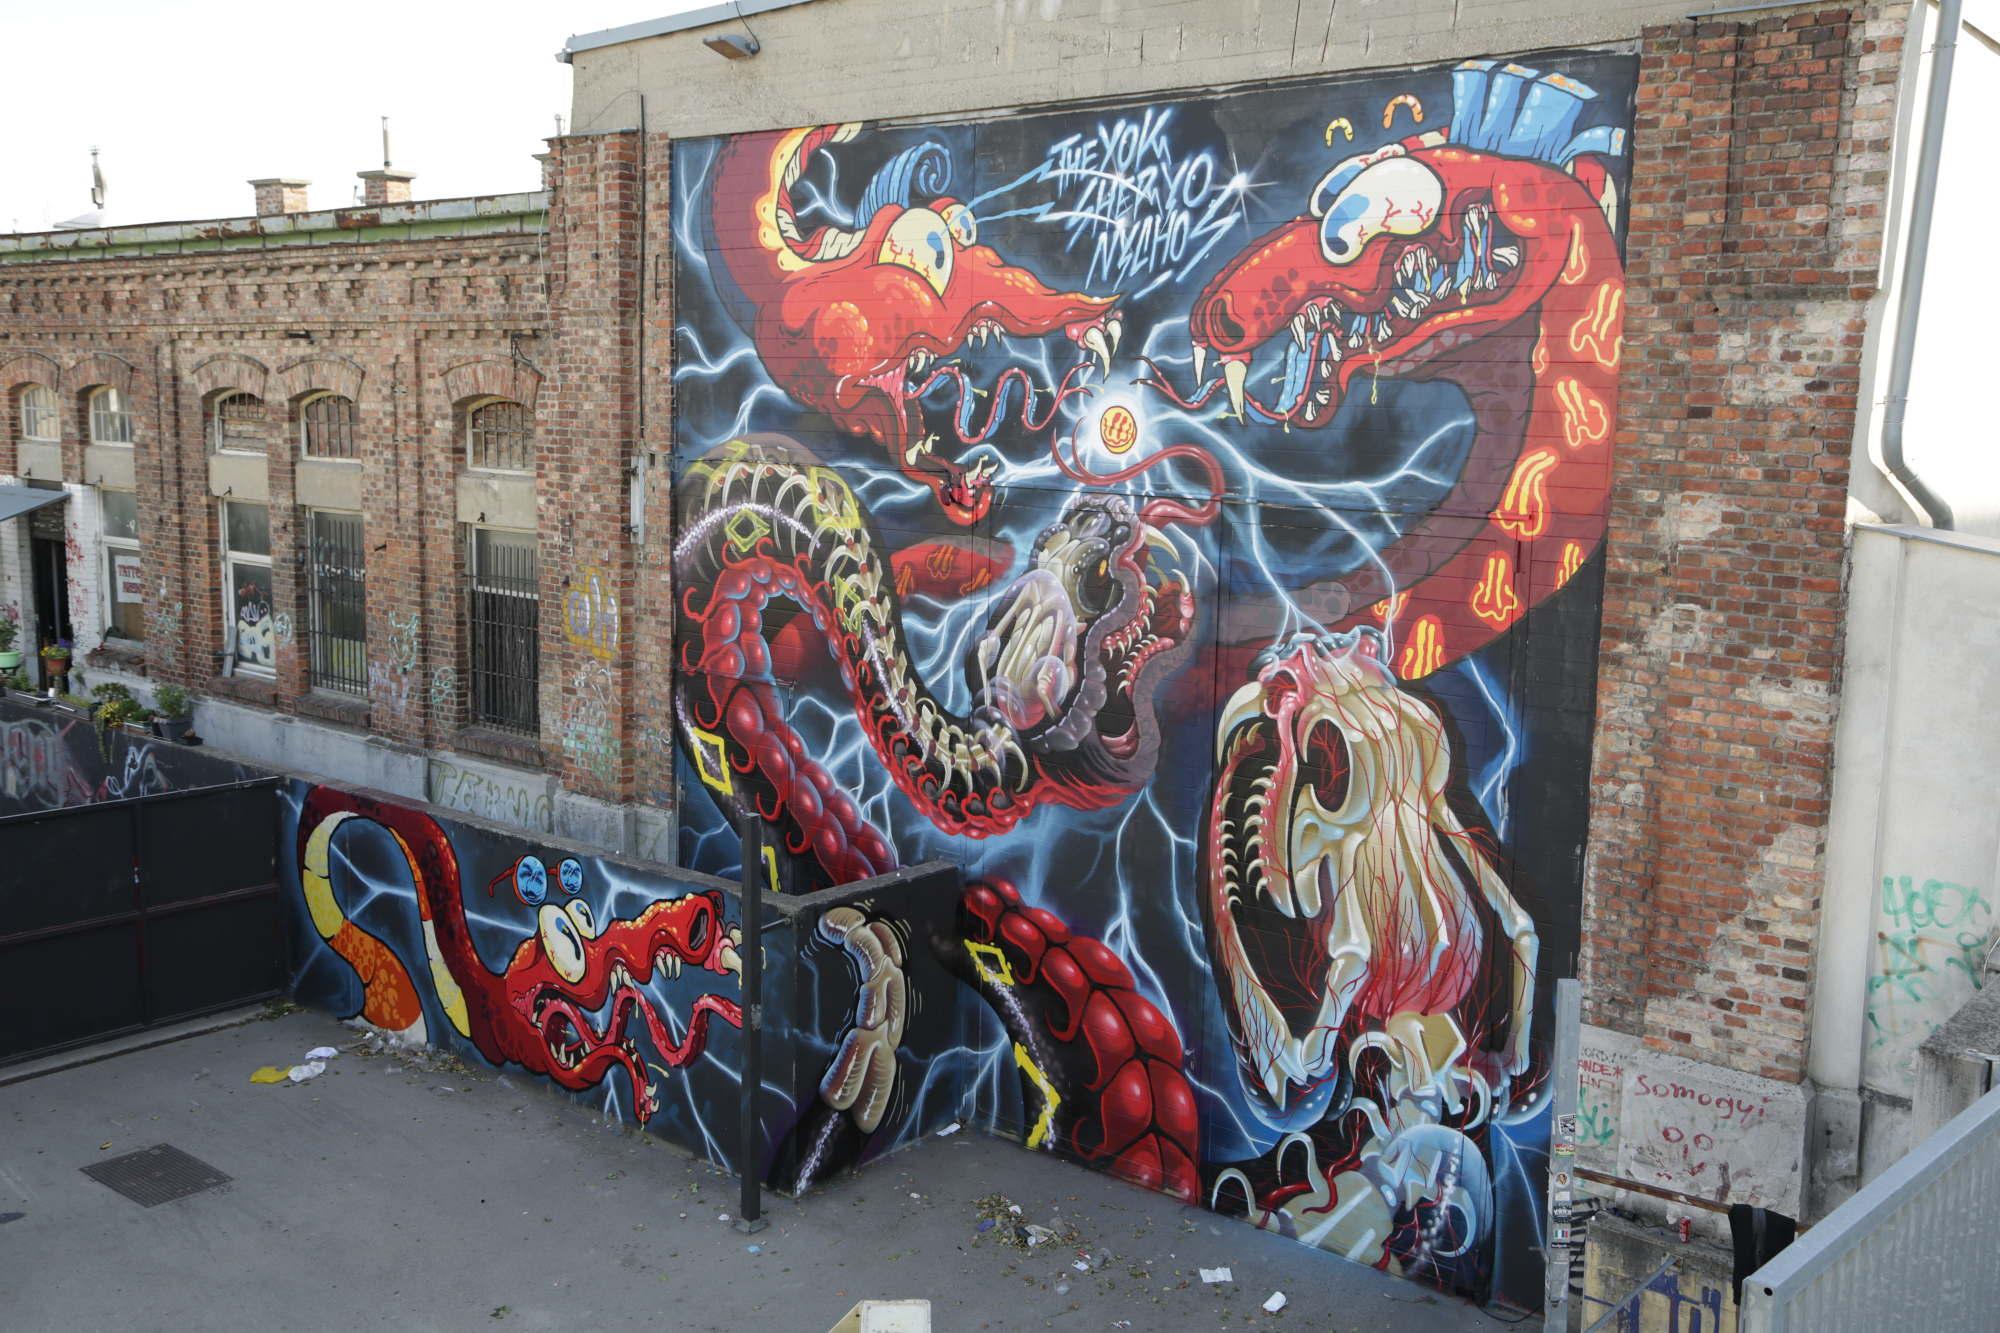 yok-sheryo-graffiti-cartoon-skateboard-2